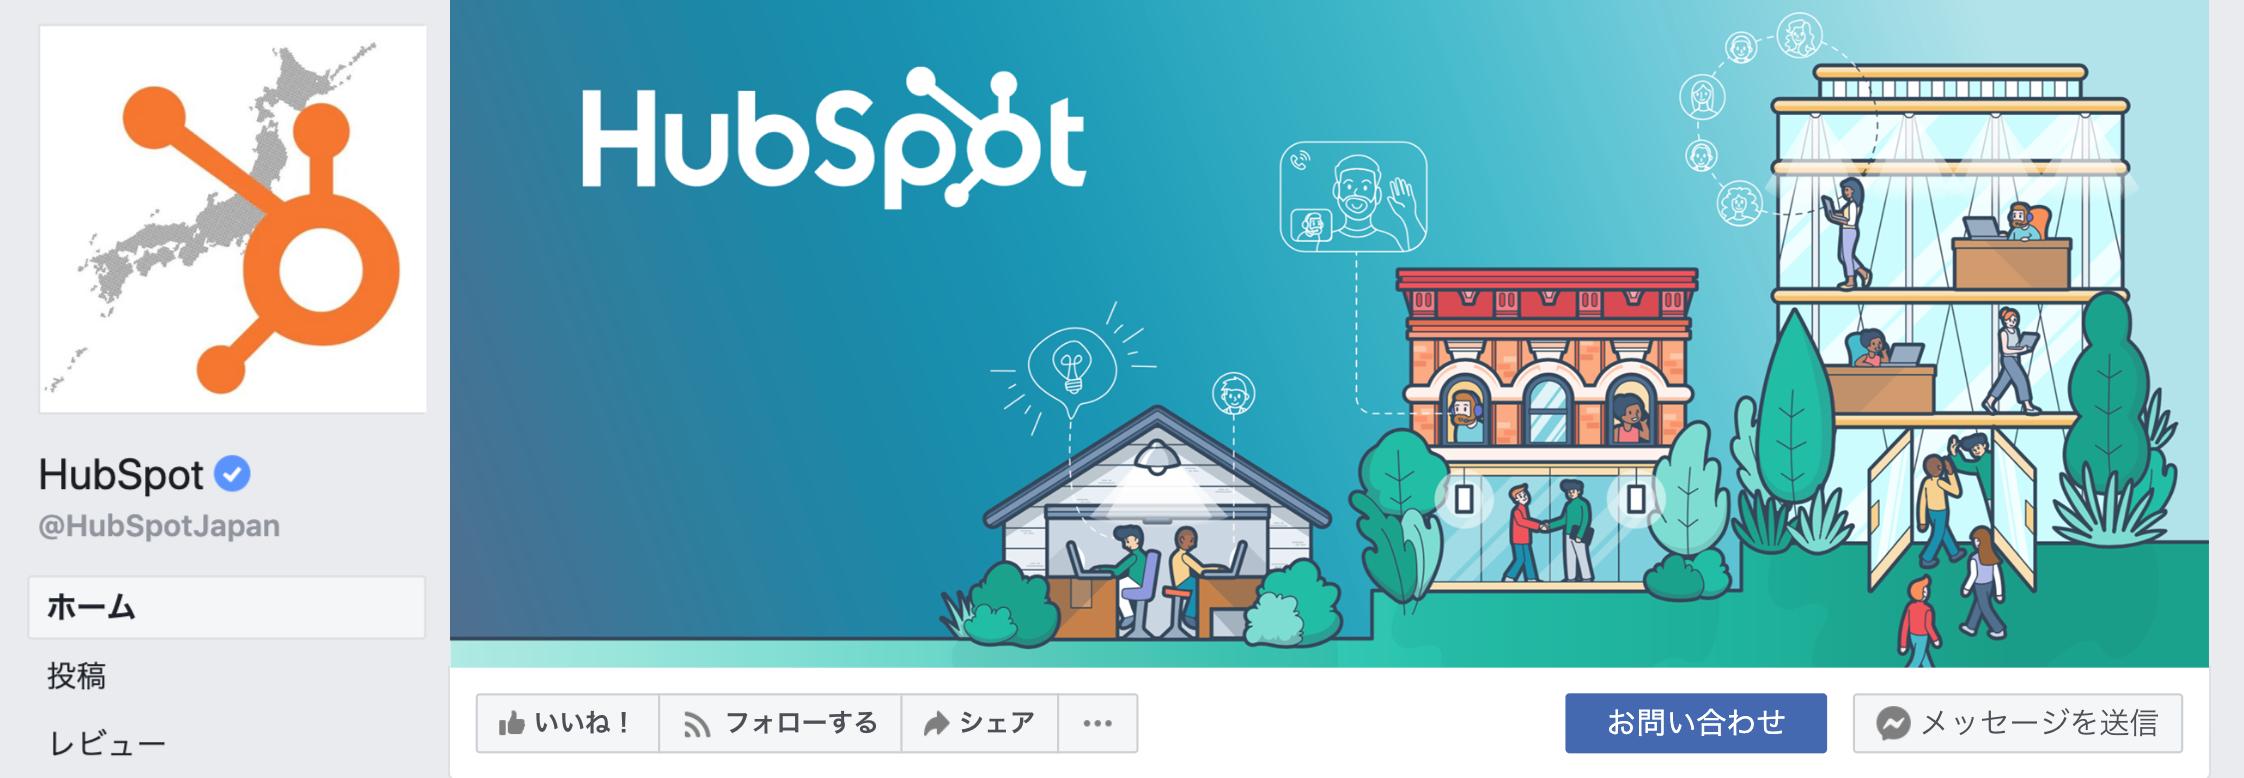 HubSpot Facebookページ